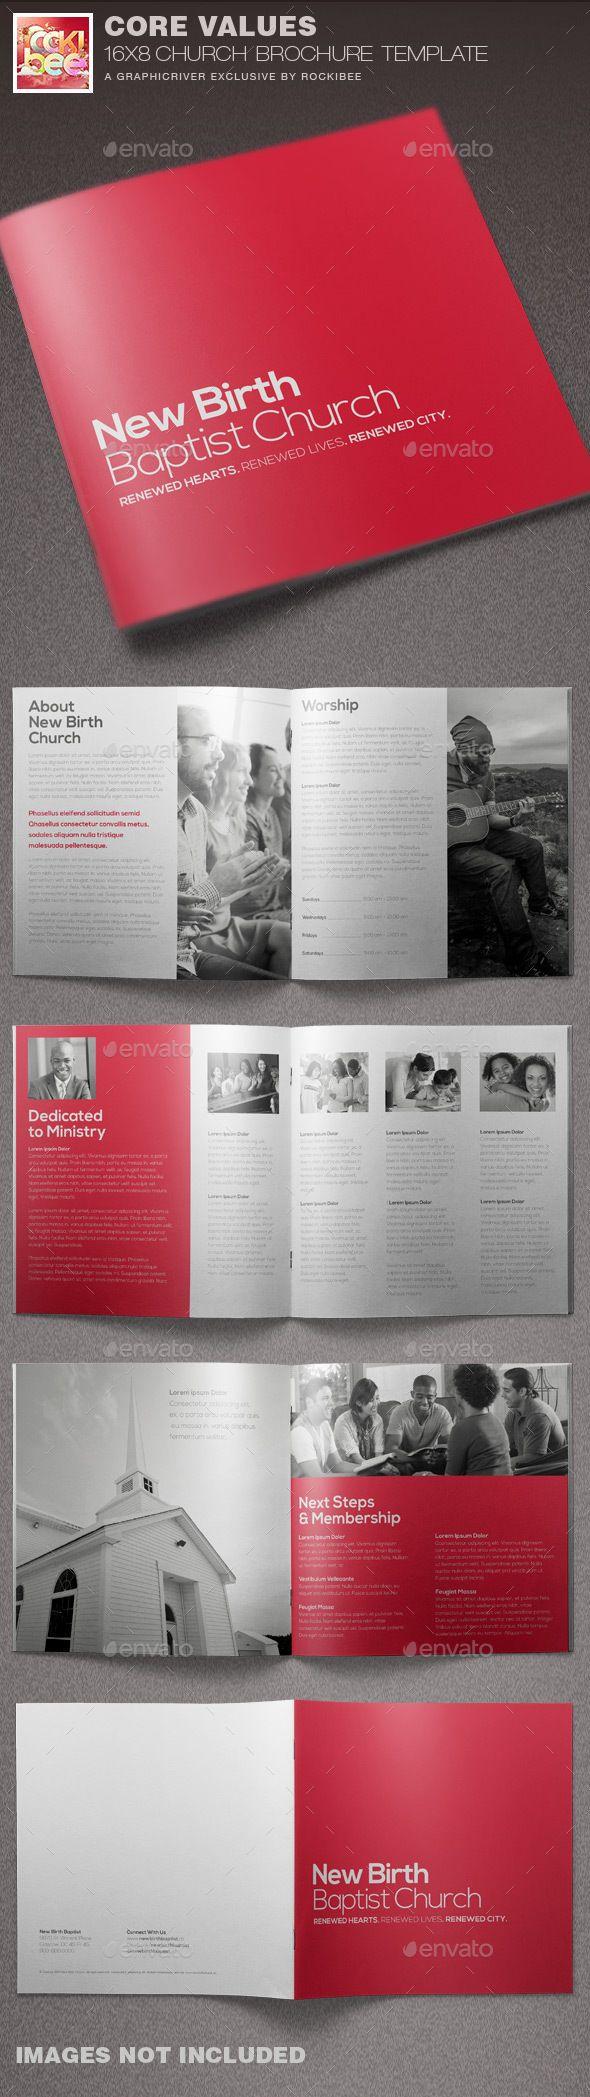 Core Values Church Brochure Template Brochure Template - Membership brochure template